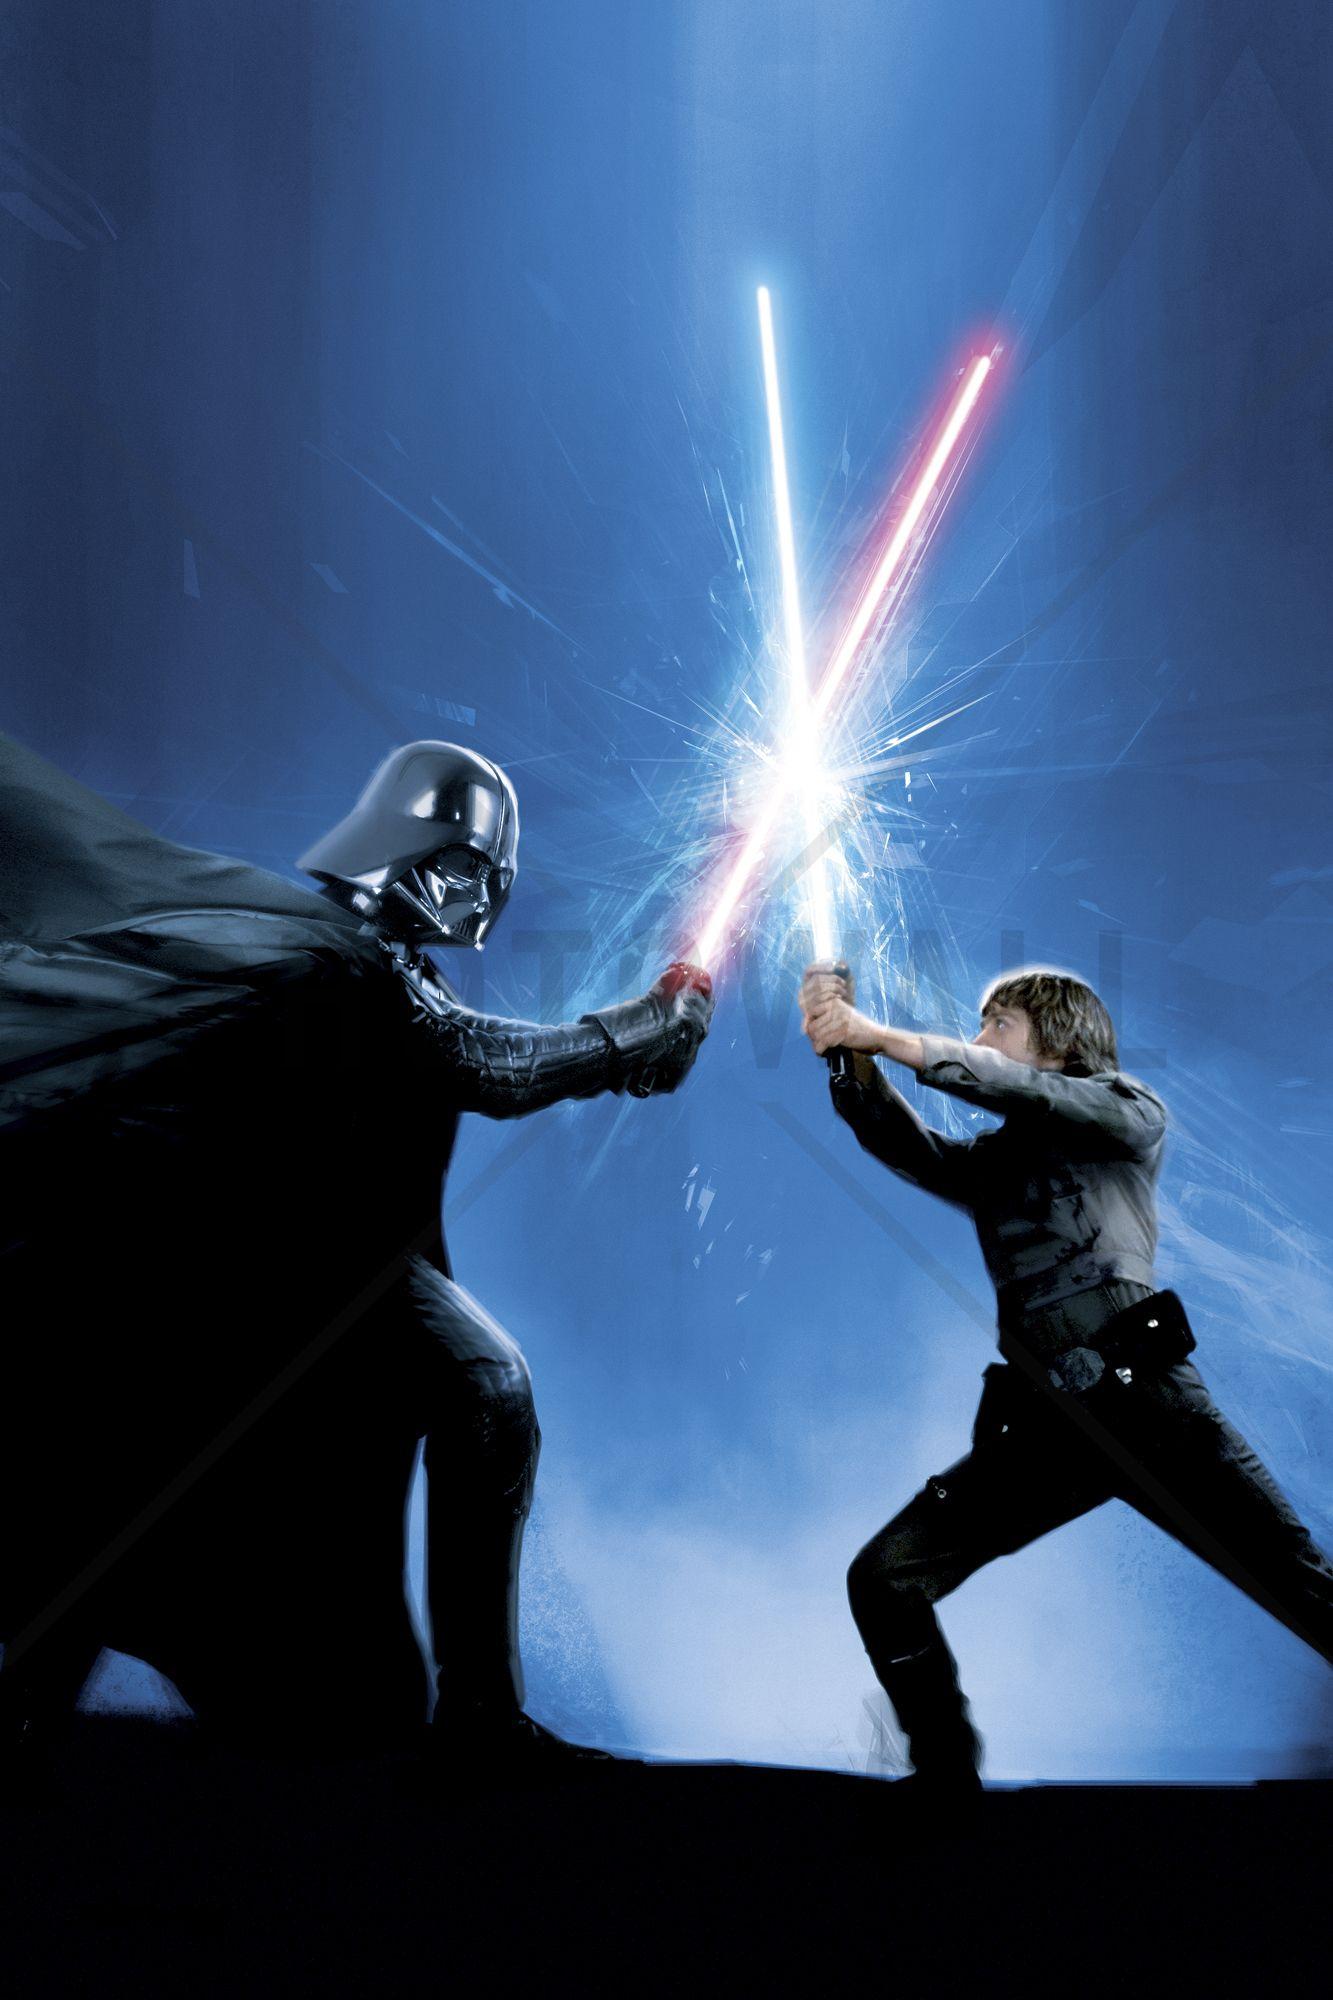 Star Wars Darth Vader and Luke Skywalker Wall Mural